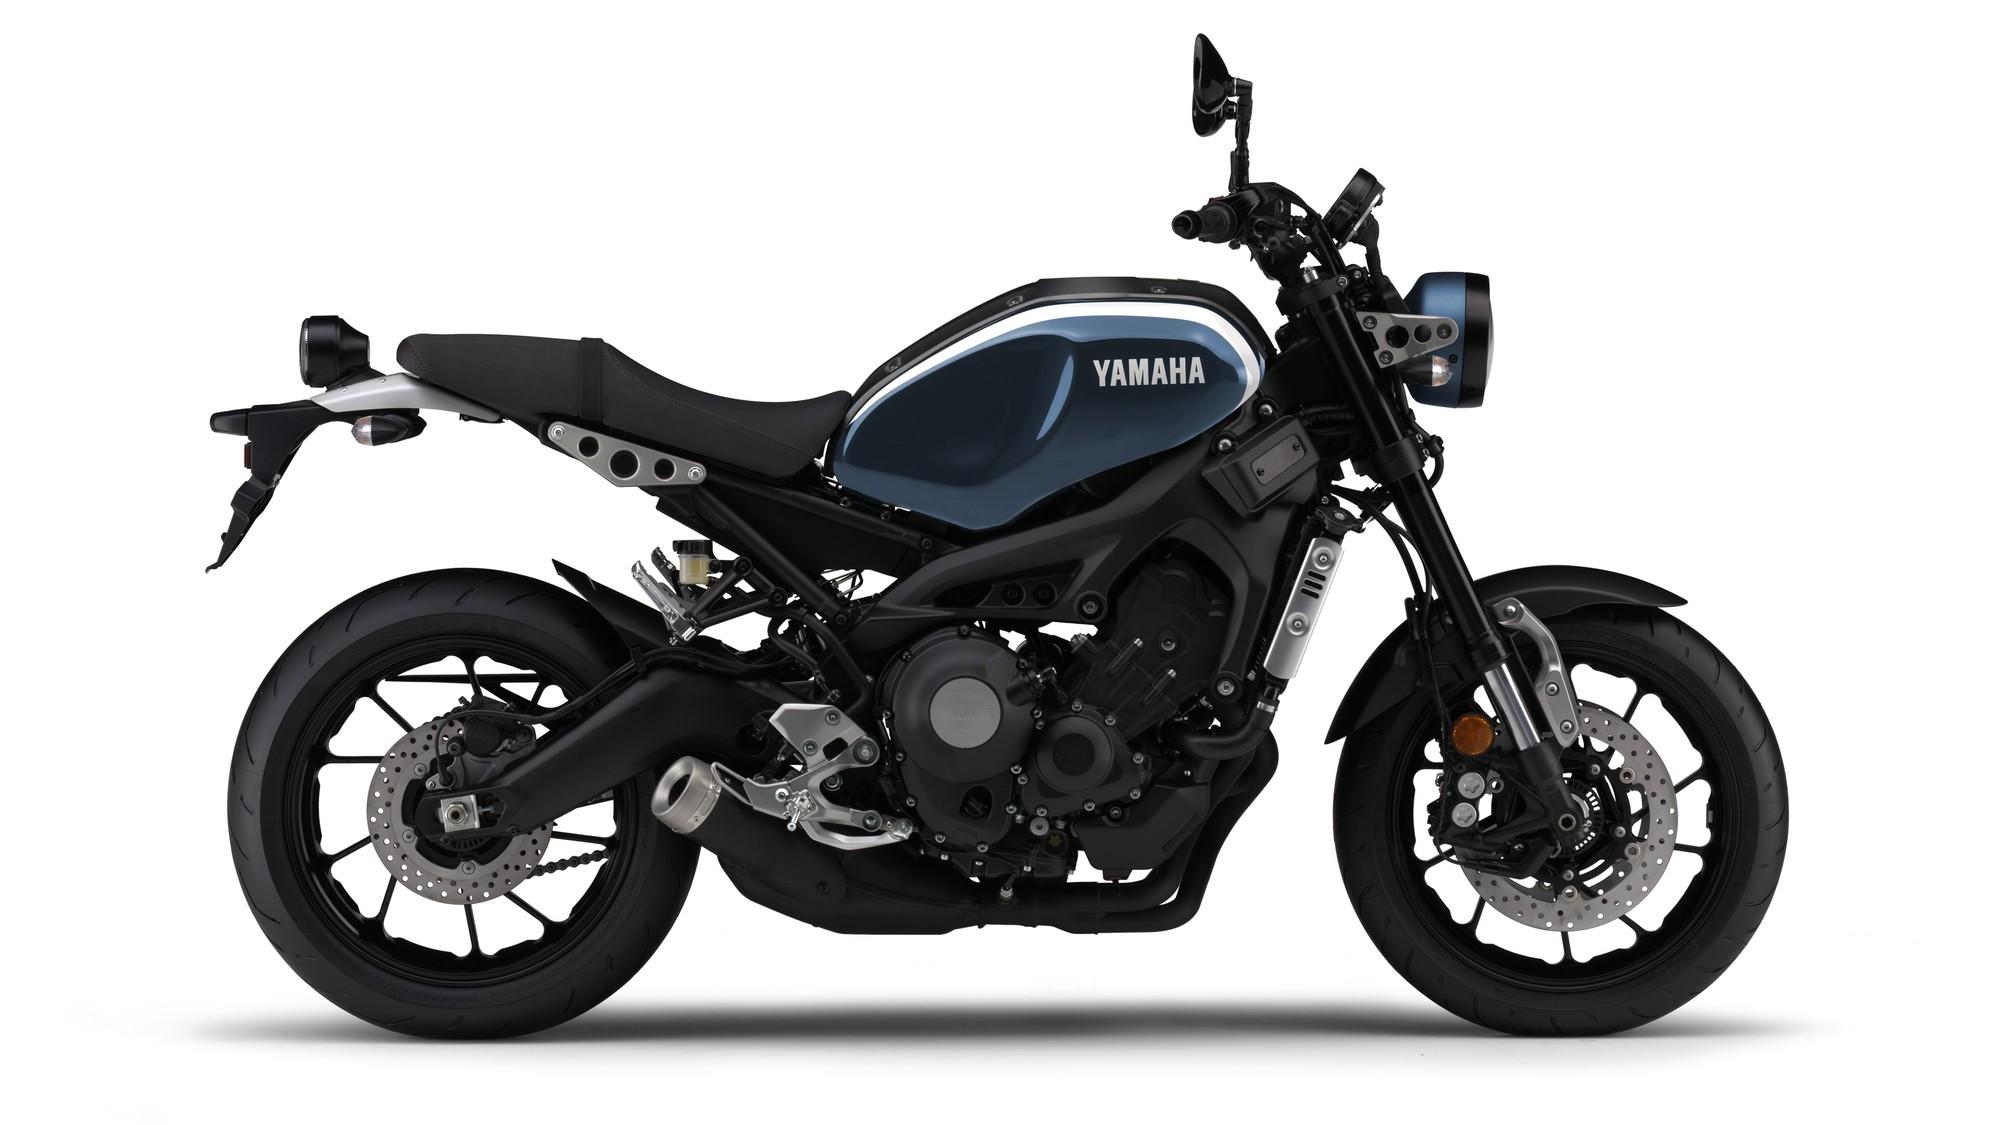 EICMA 2015 Yamaha XSR900 Is Your MT 09 Retro Wasp